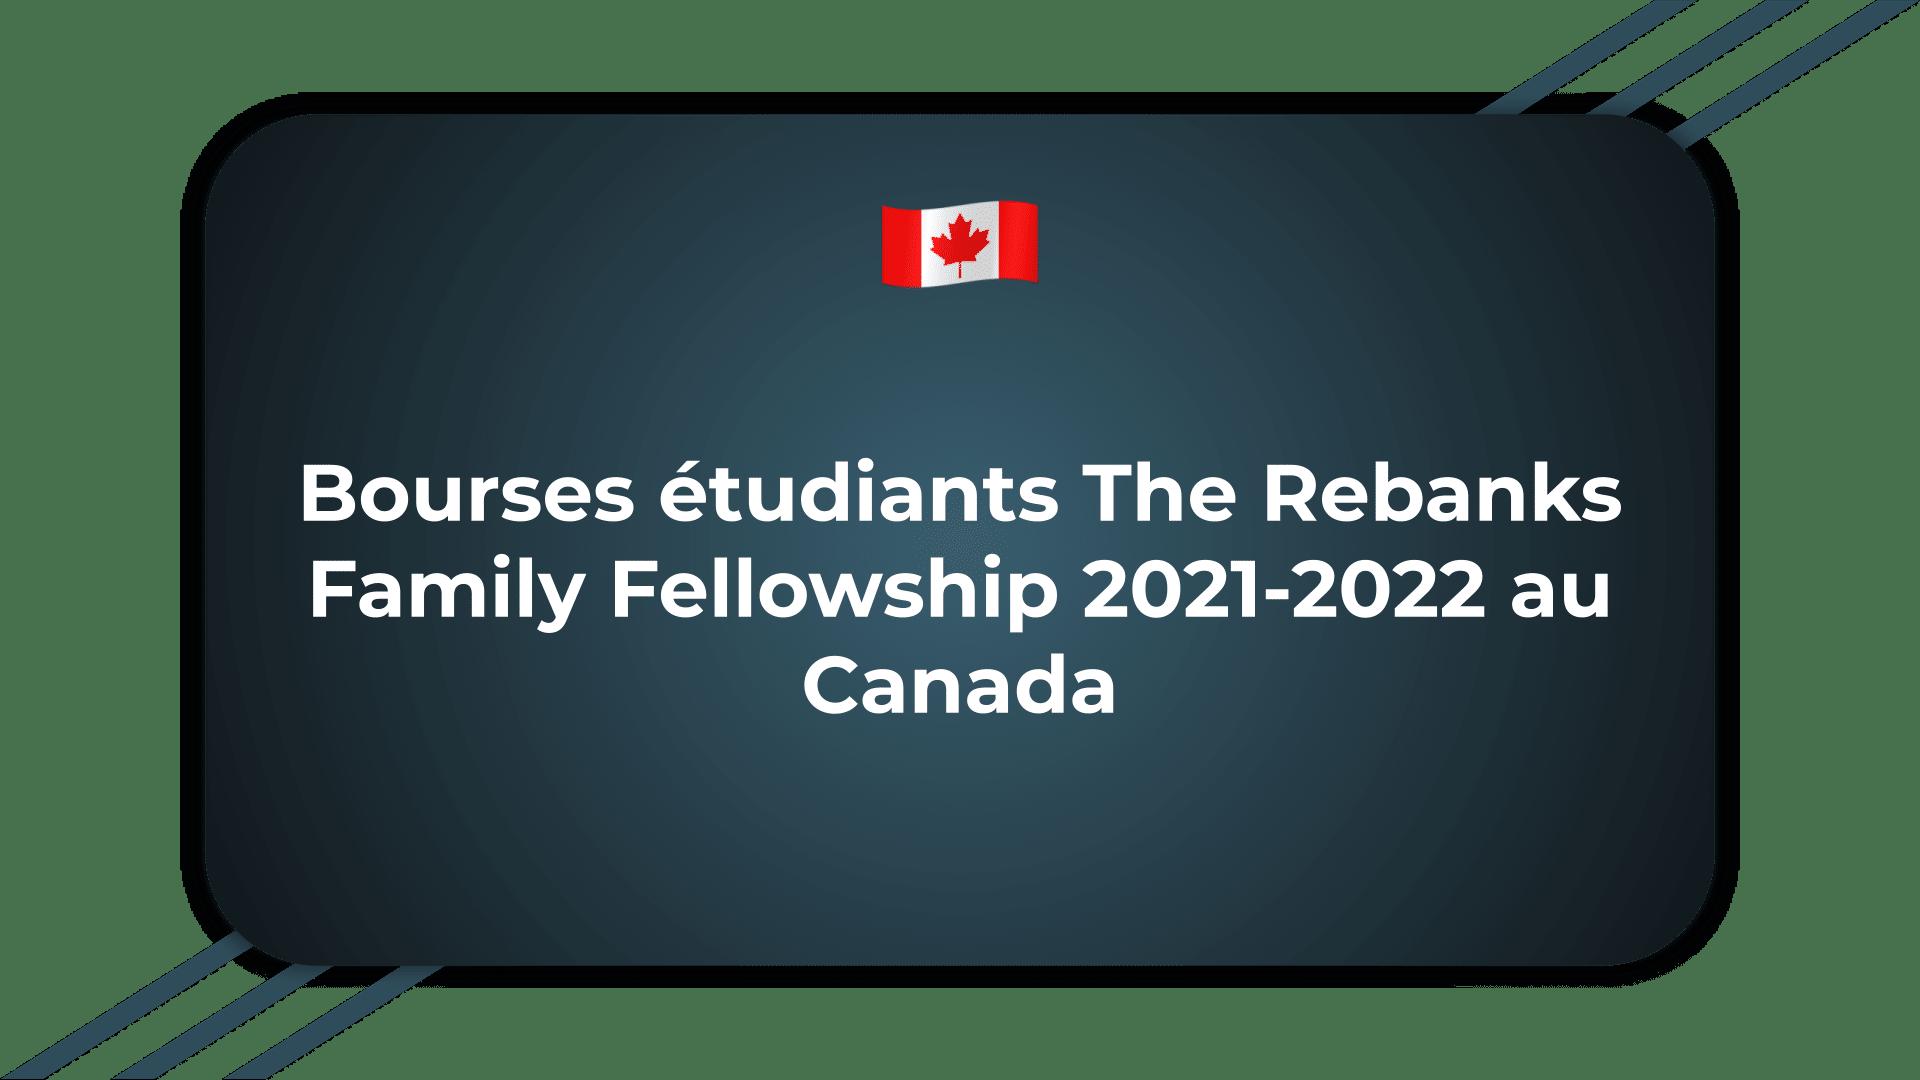 Bourses étudiants The Rebanks Family Fellowship